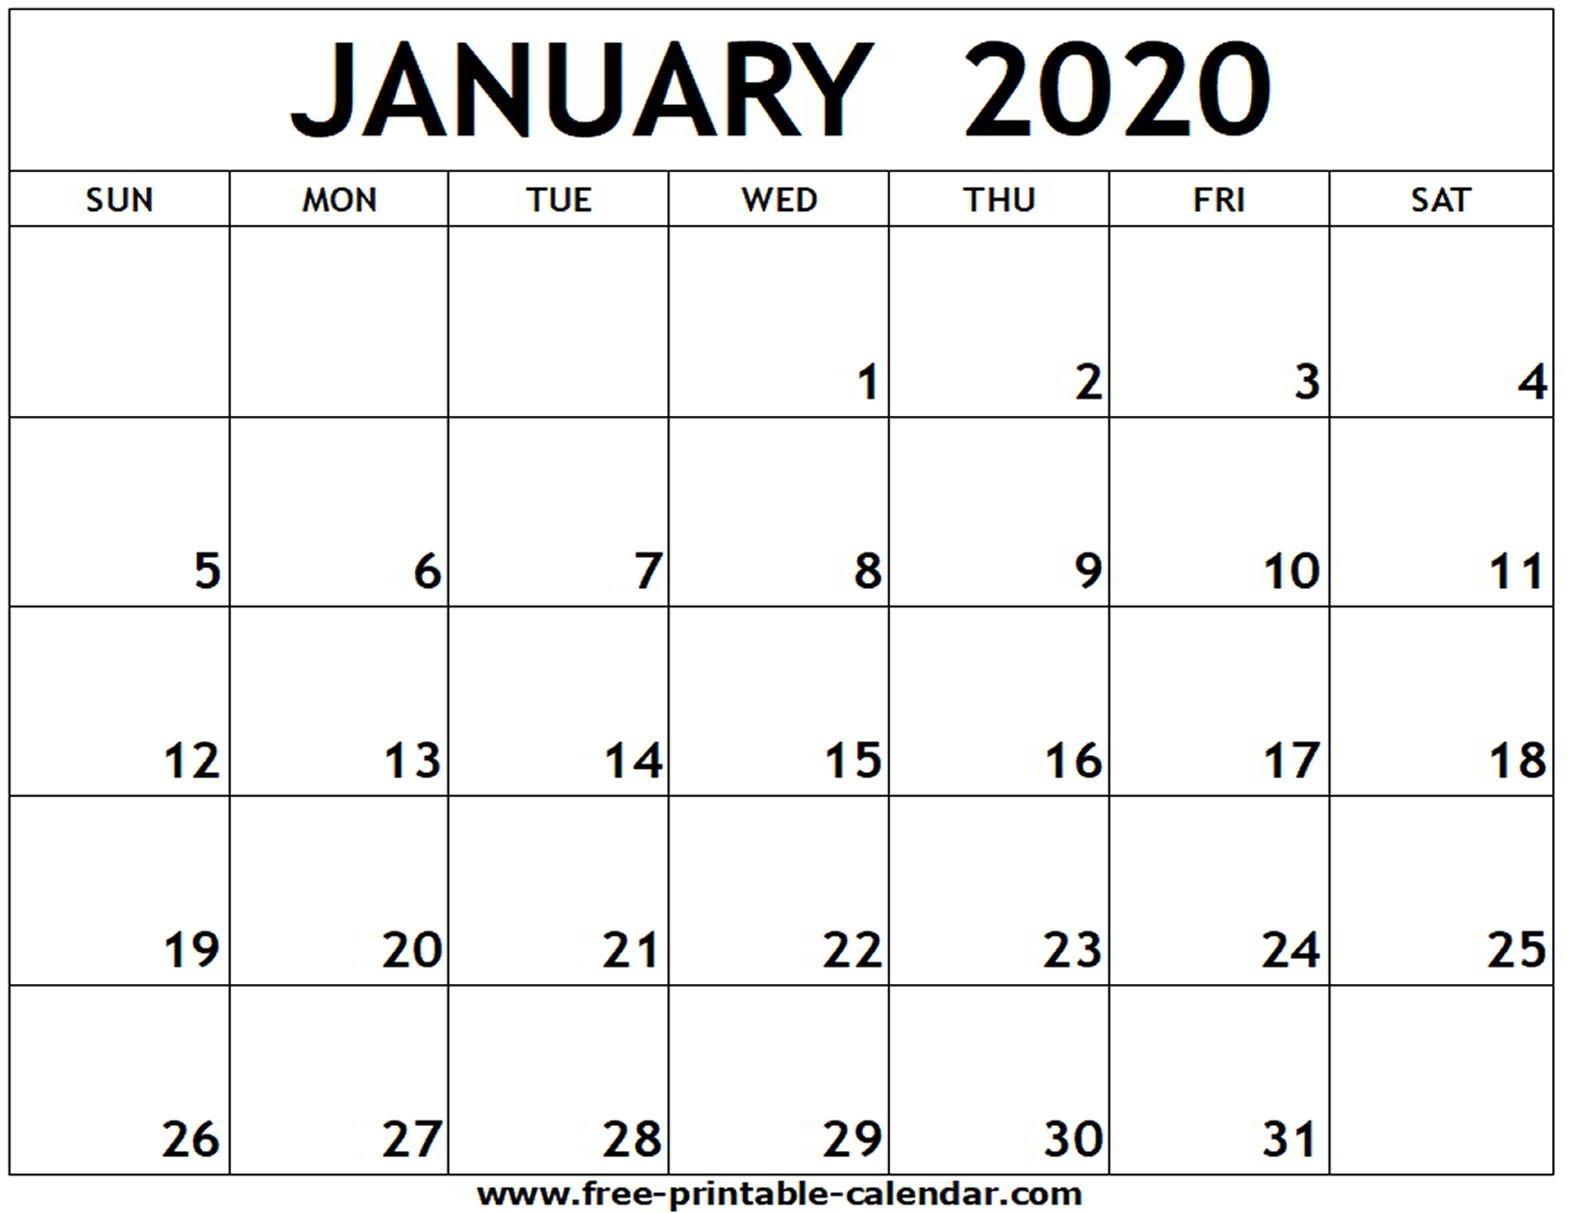 January 2020 Printable Calendar - Free-Printable-Calendar-Blank Calendar Template January 2020